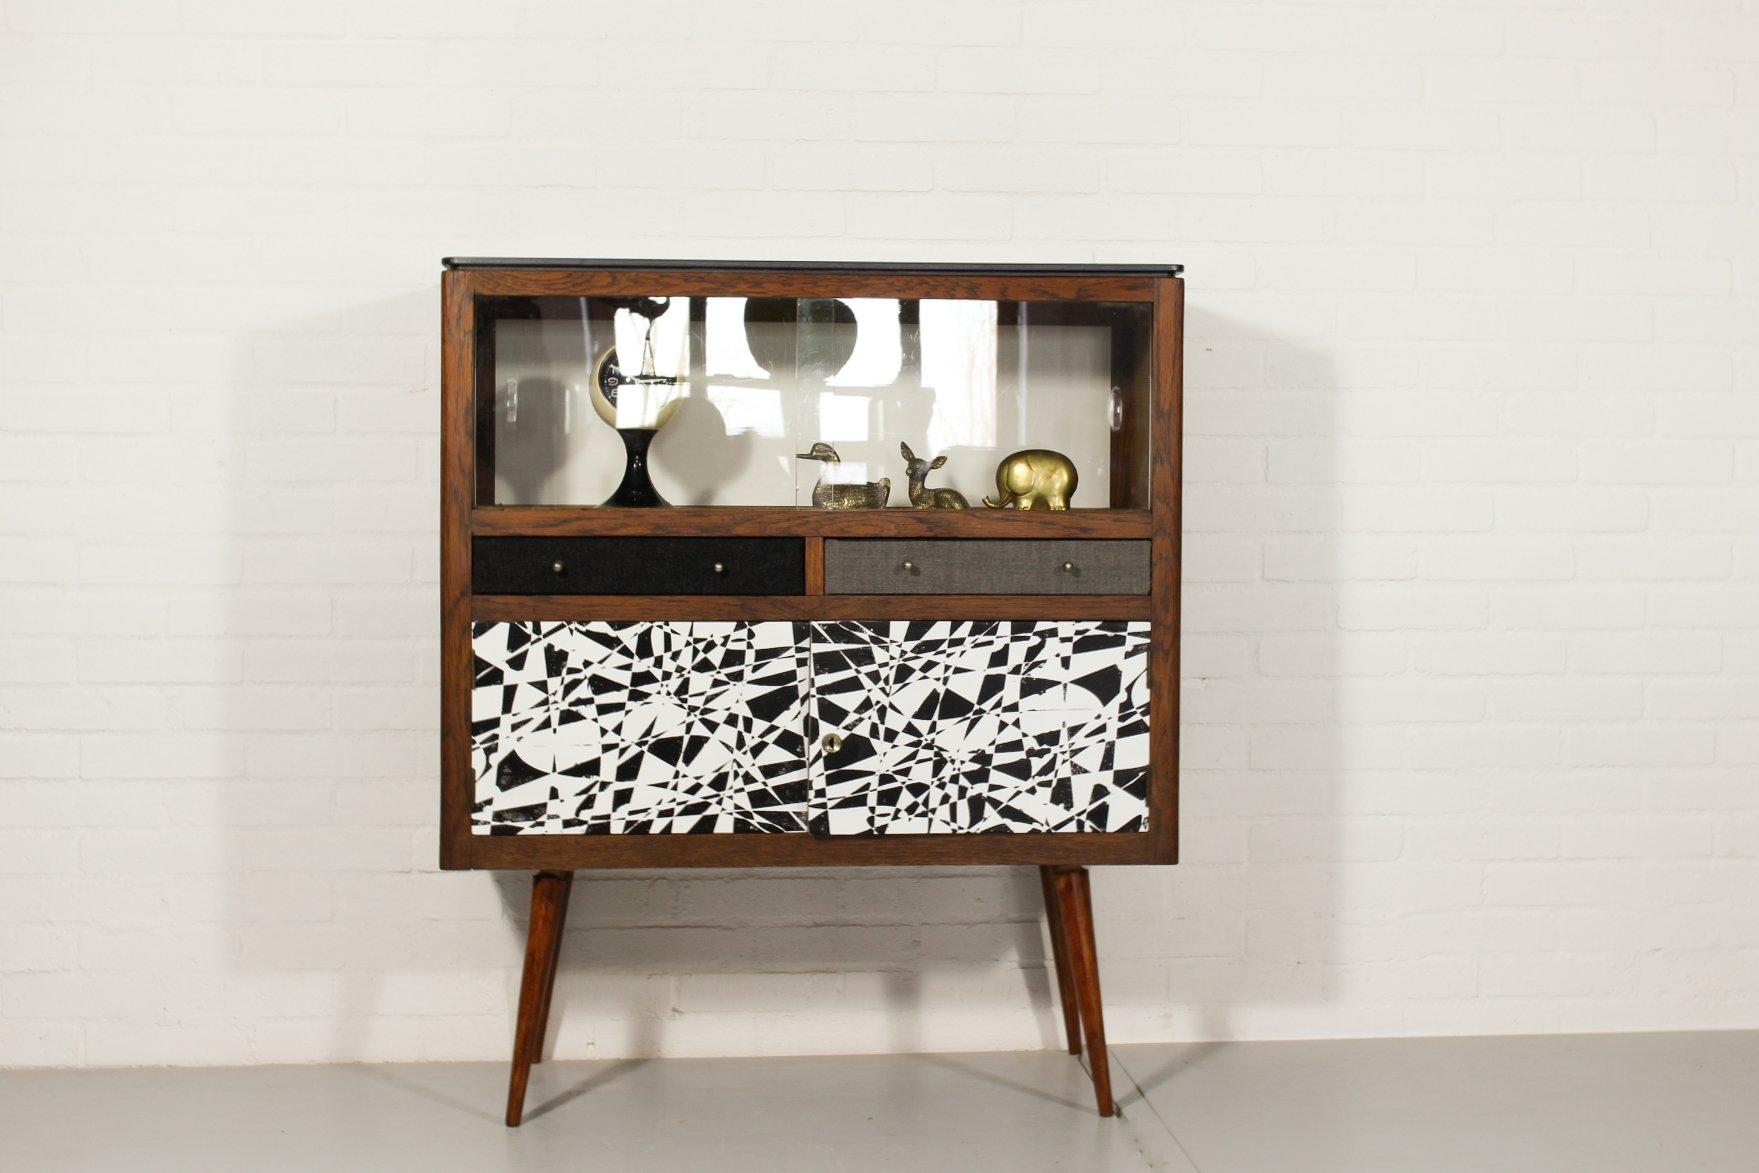 meuble vitrine vintage en vente sur pamono. Black Bedroom Furniture Sets. Home Design Ideas